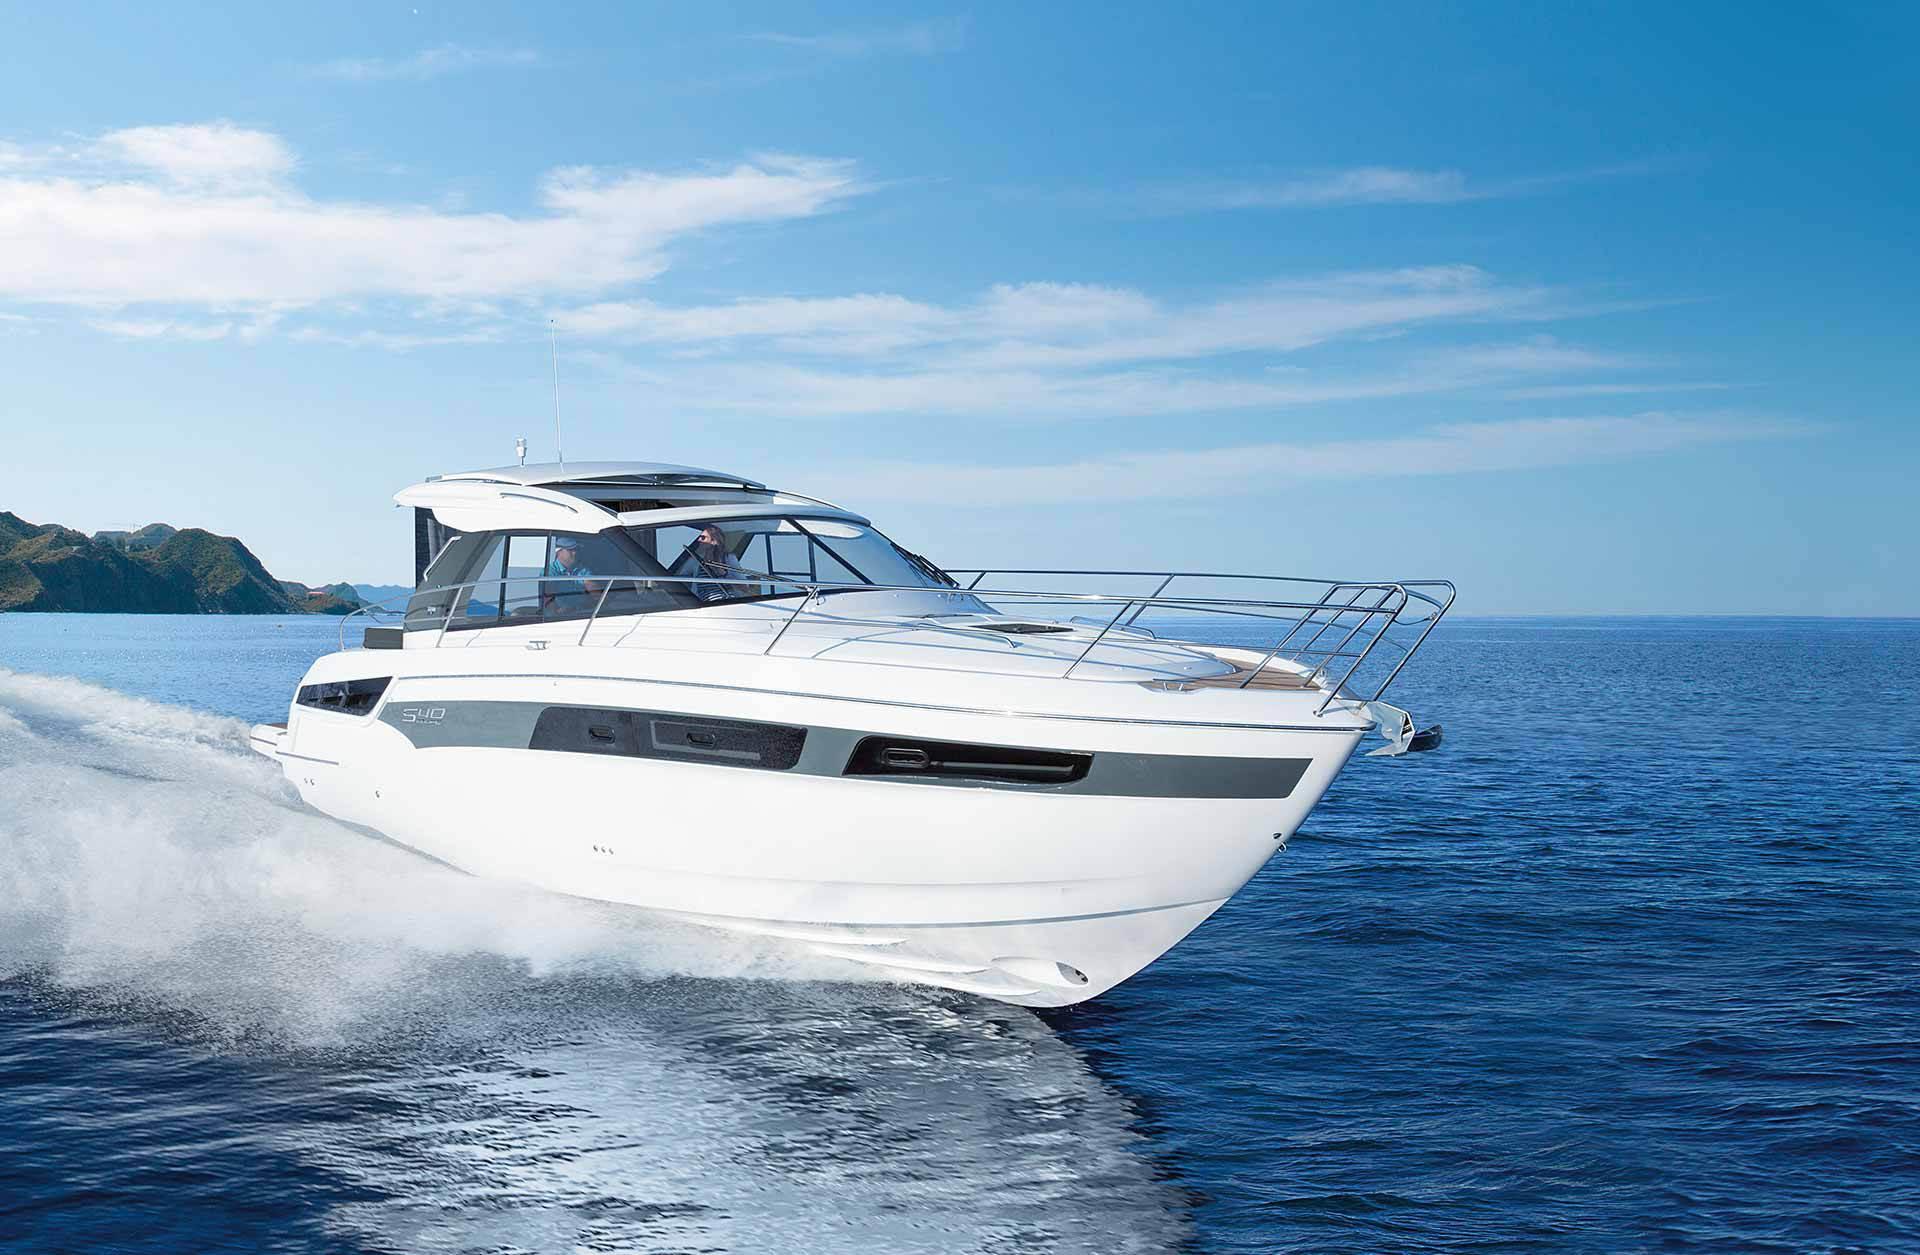 Bavaria s40 coupe clipper marine spain bavaria distributor - Coupe bruit exterieur ...